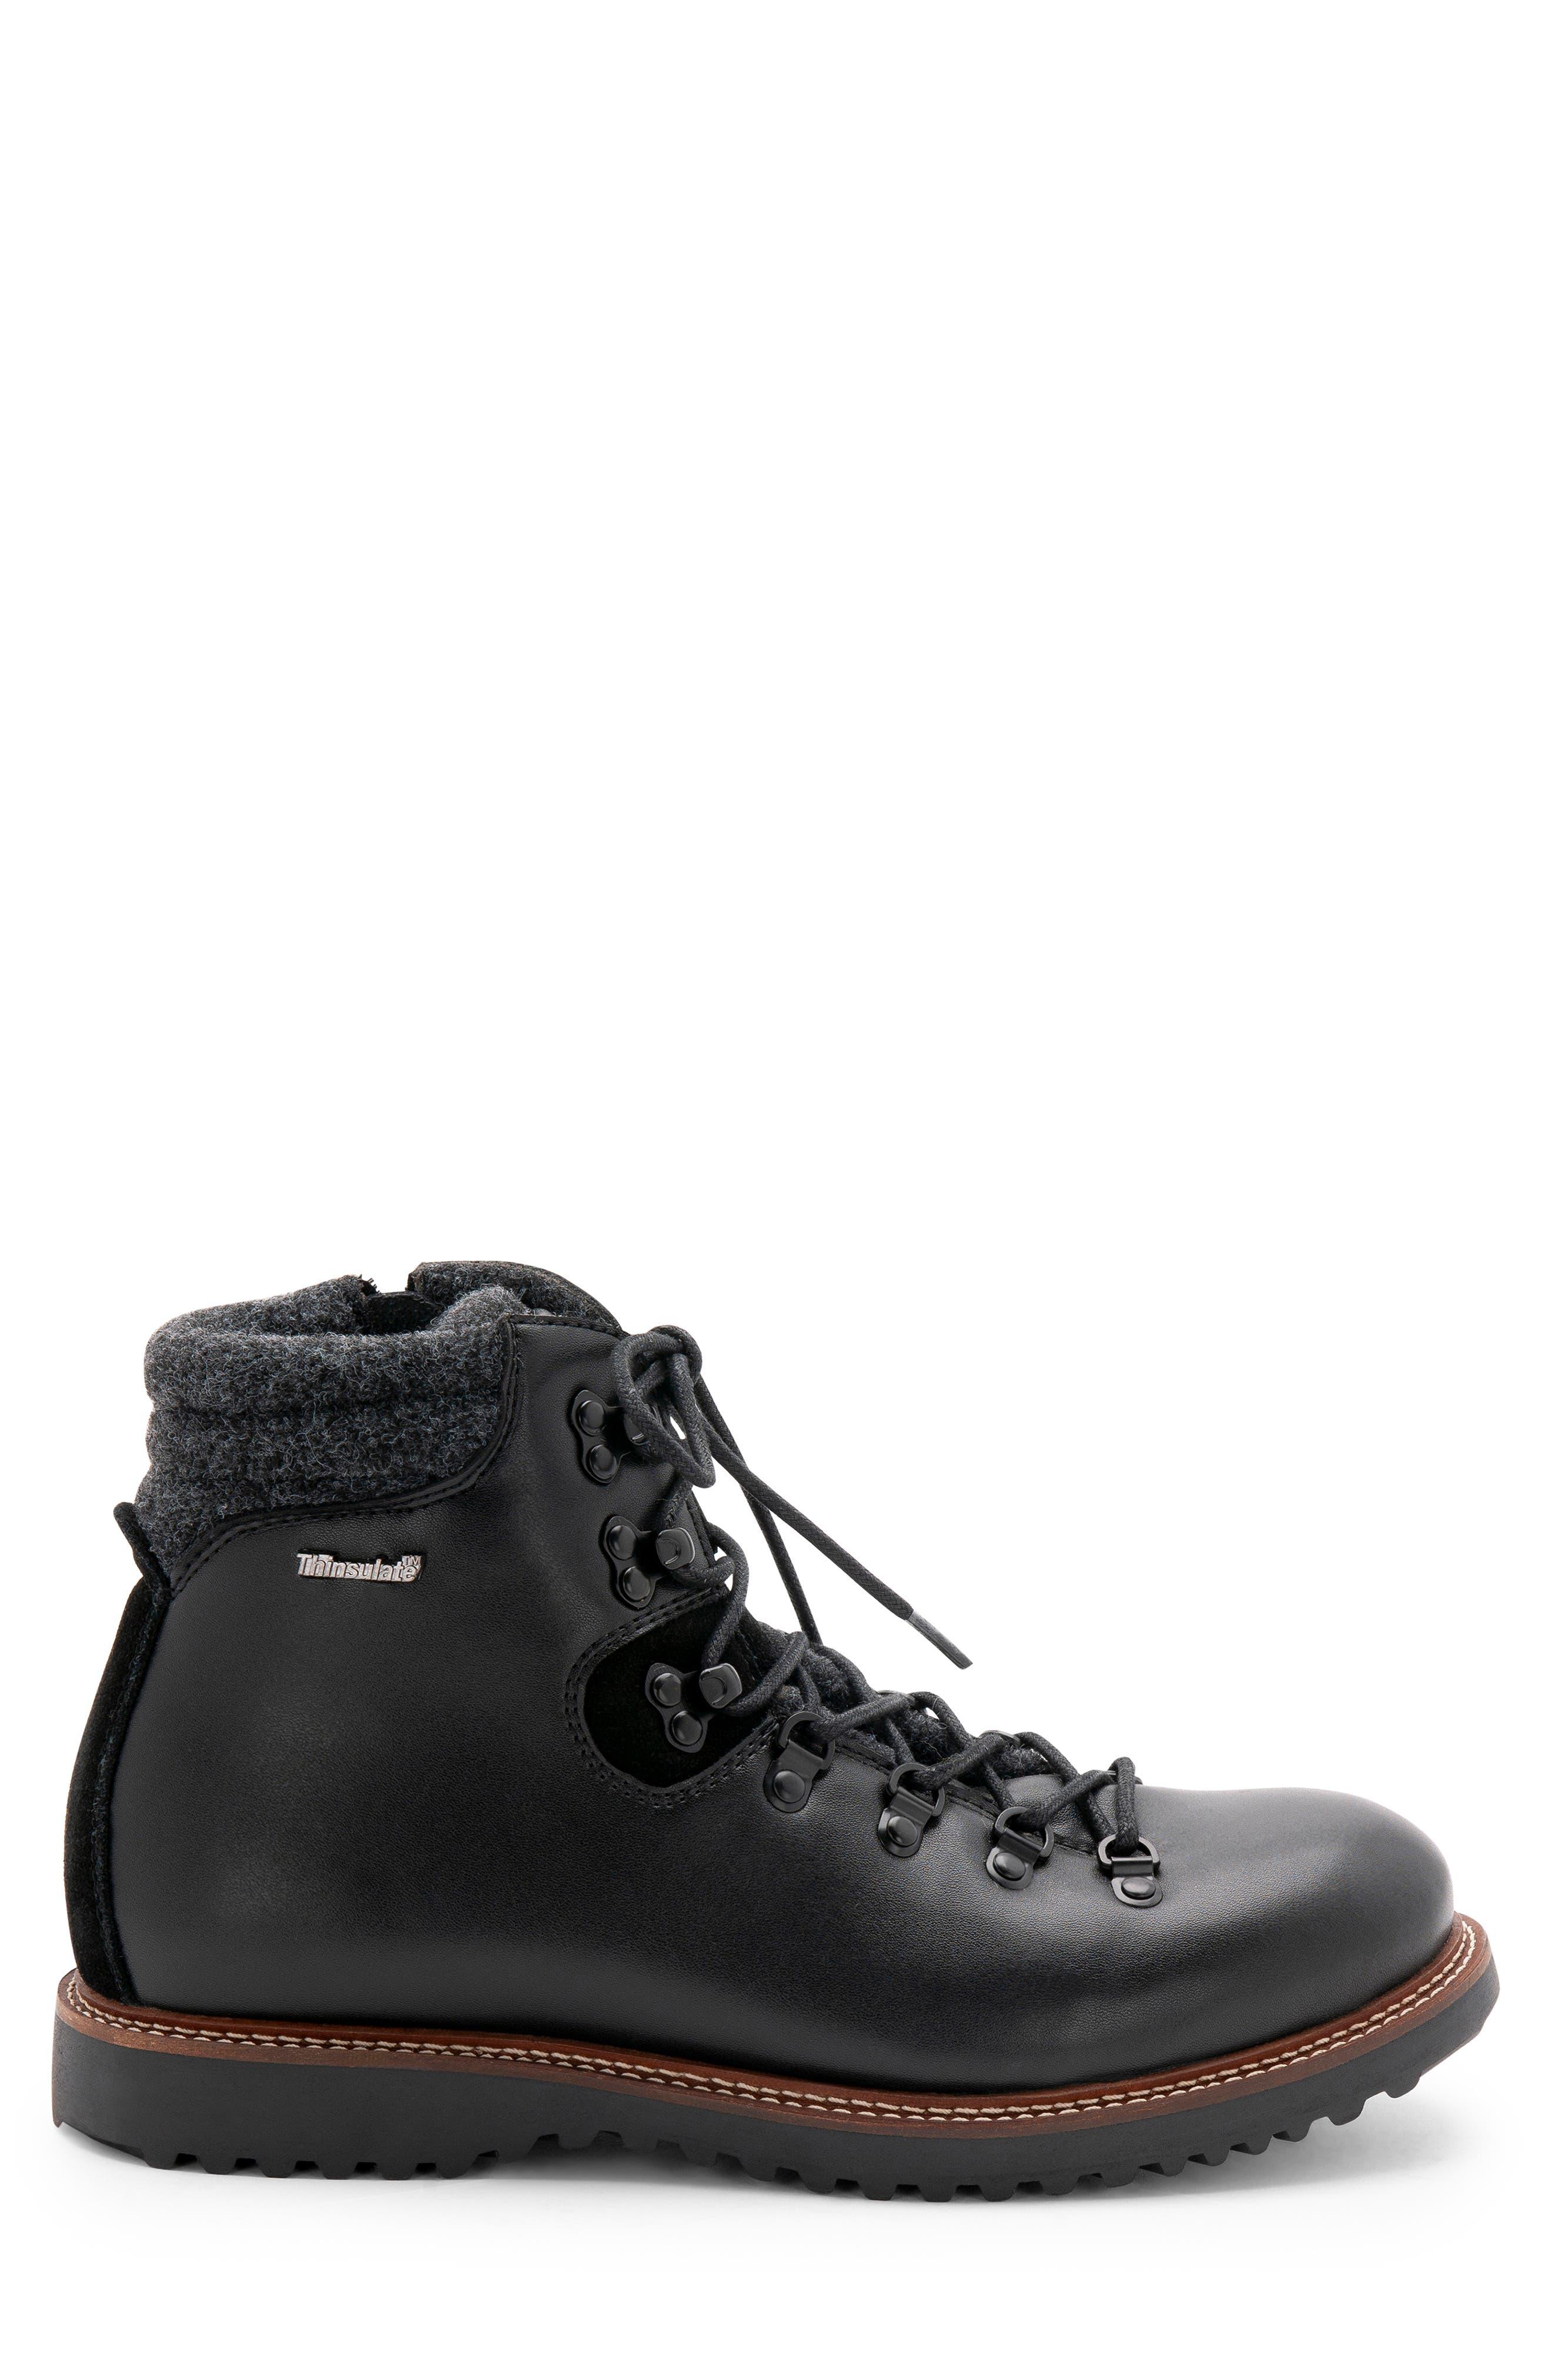 Morgan Waterproof Plain Toe Boot,                             Alternate thumbnail 3, color,                             BLACK LEATHER